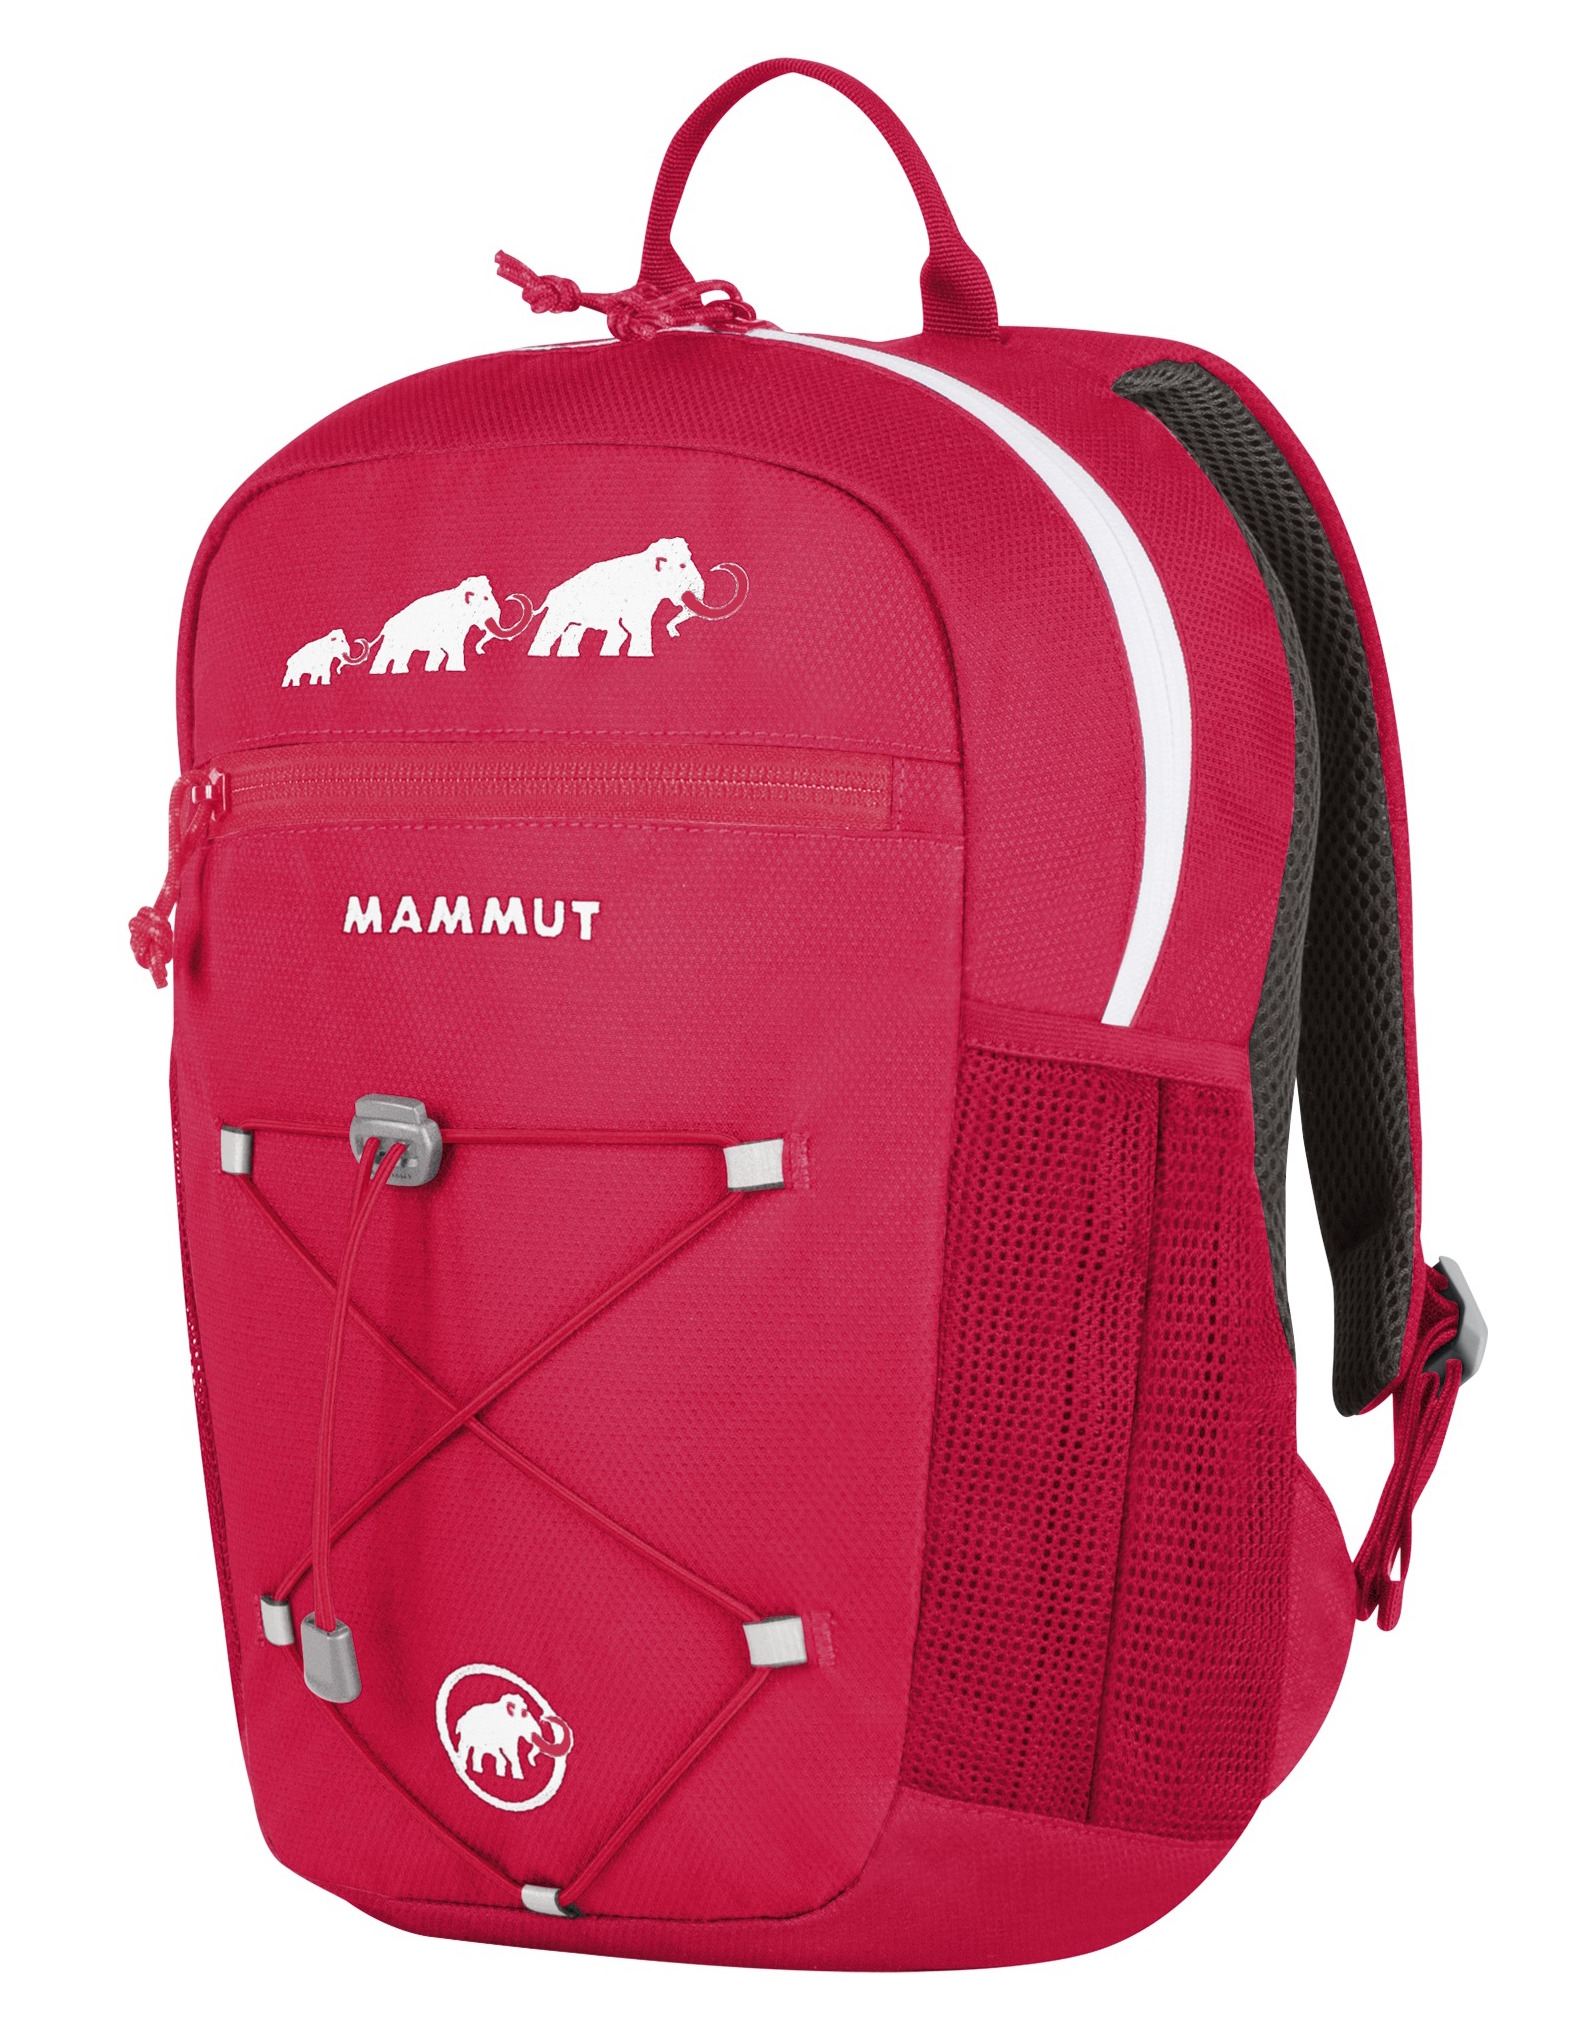 Mammut First Zip - Rucksack - Kinder